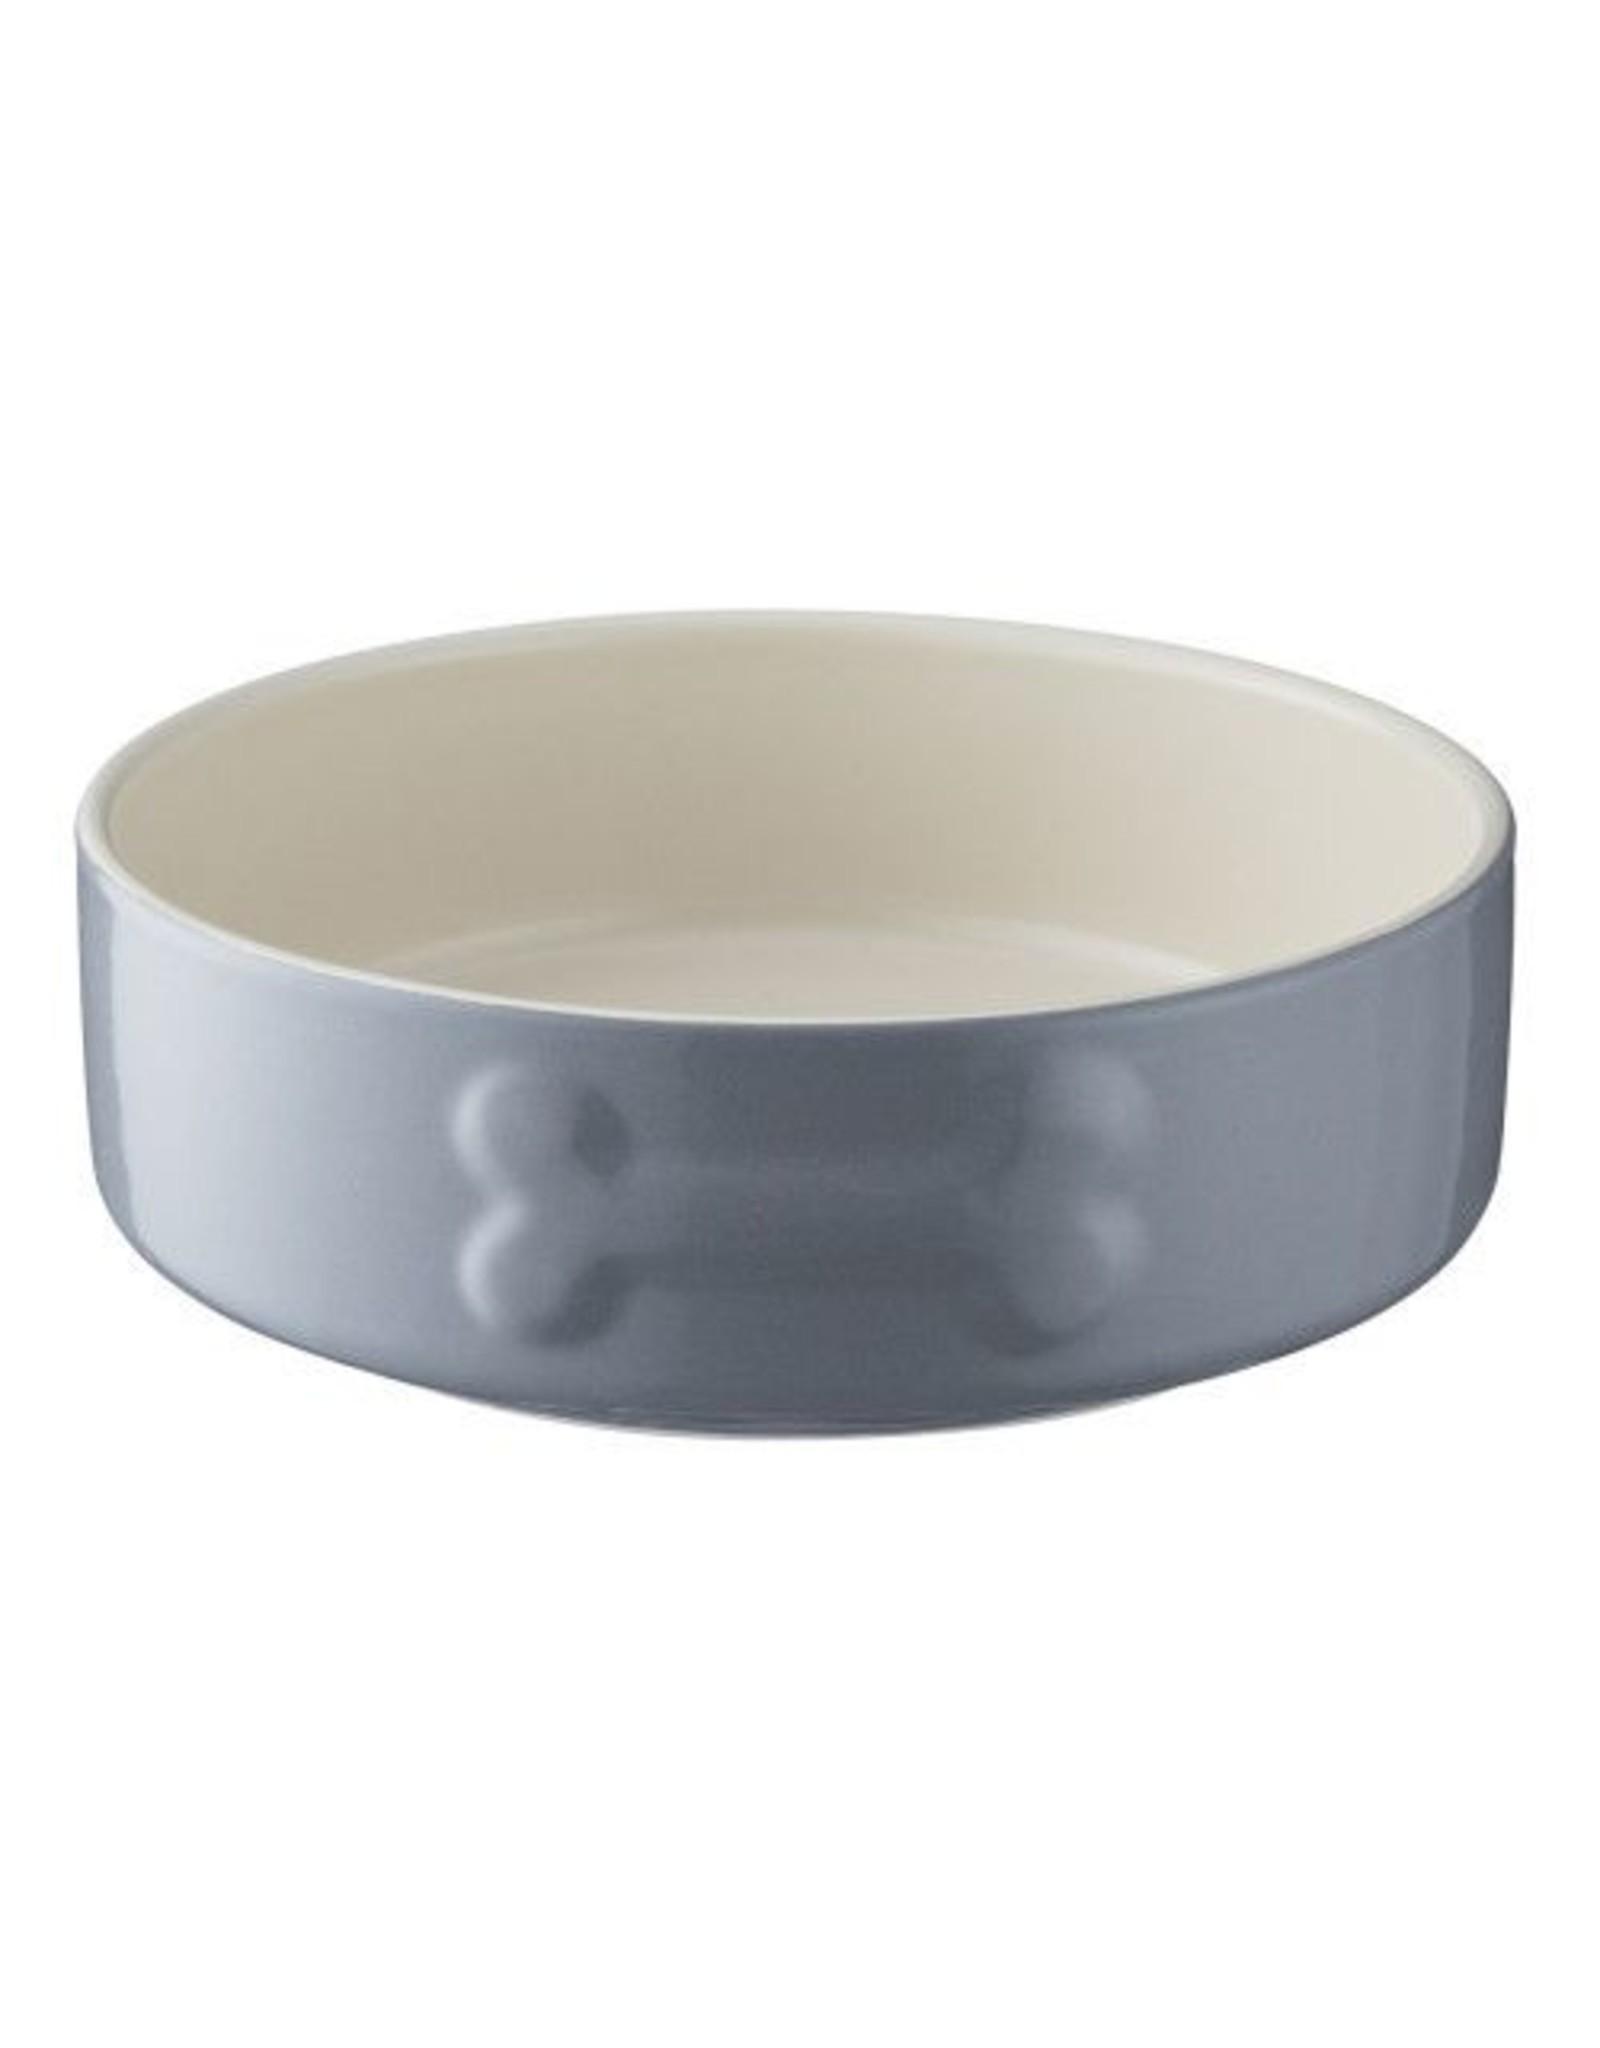 Mason Cash Colour Mix Stoneware Dog Bowl, 15cm 6inch